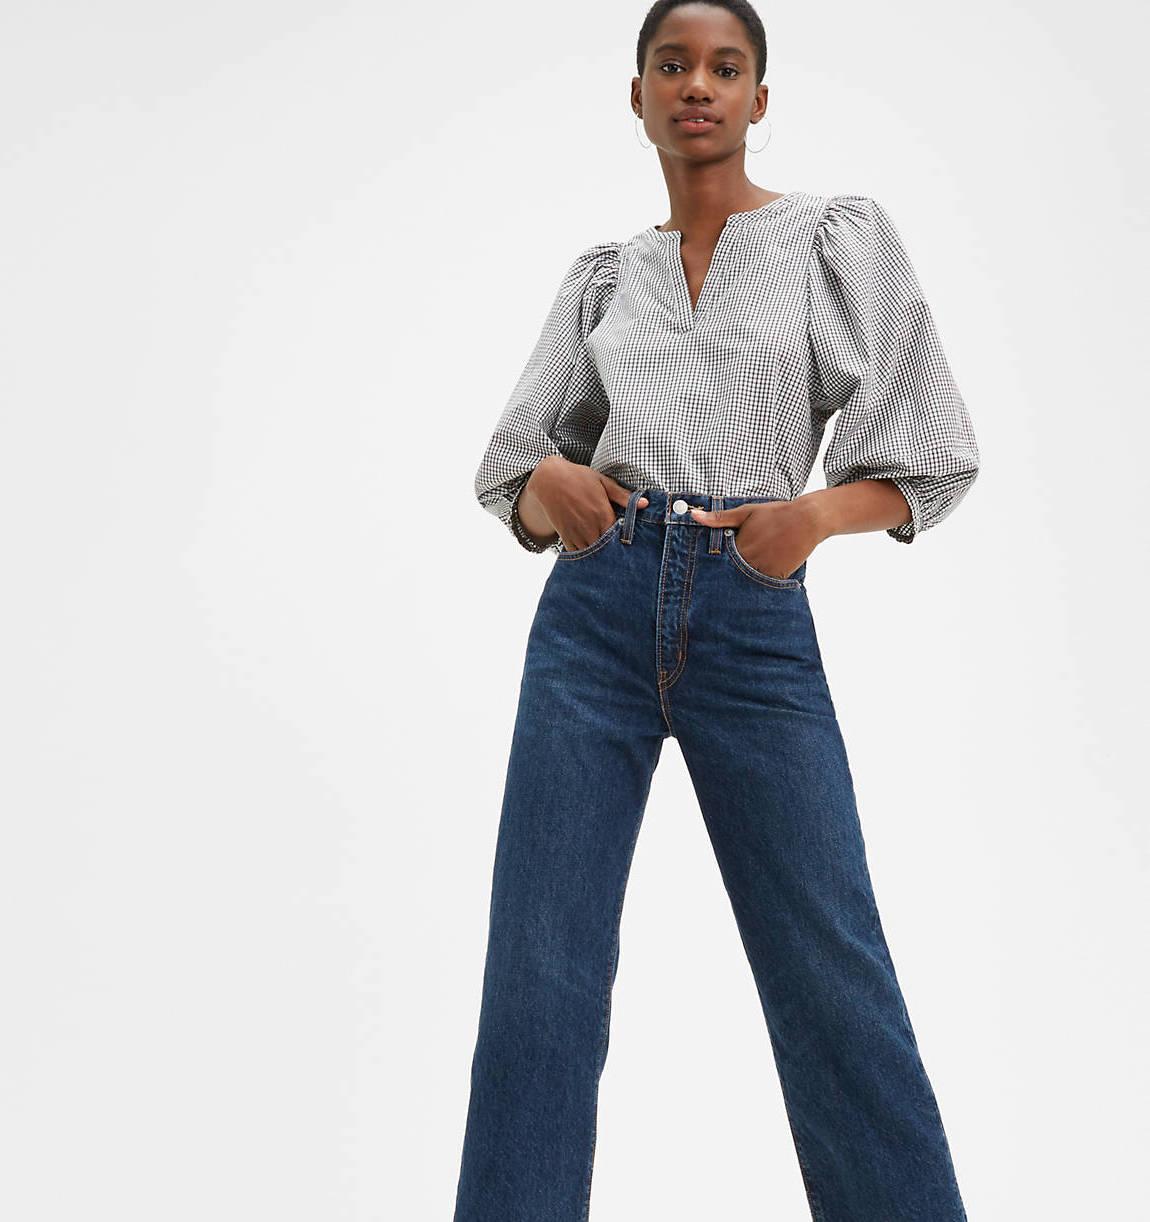 Levis-hemp-jeans